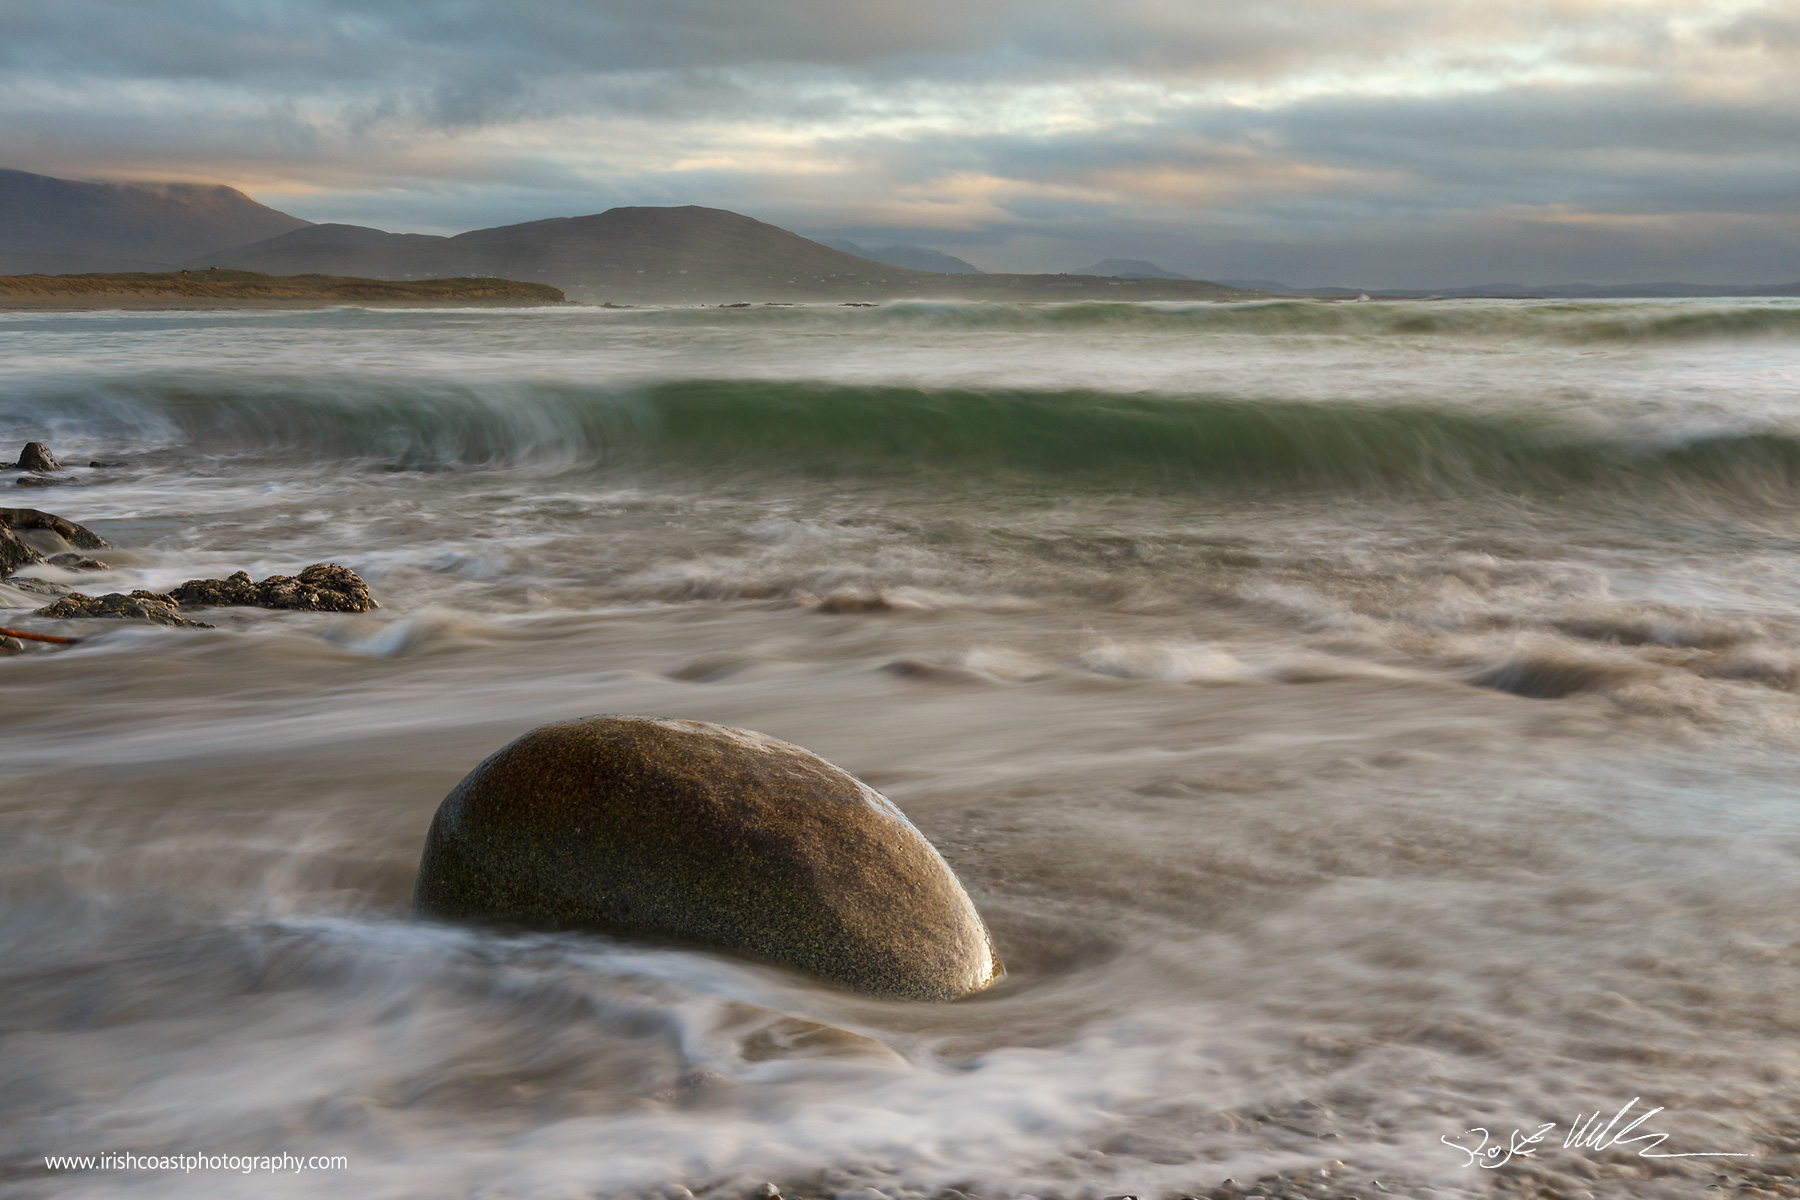 Emlagh-stone-14-11-17.jpg